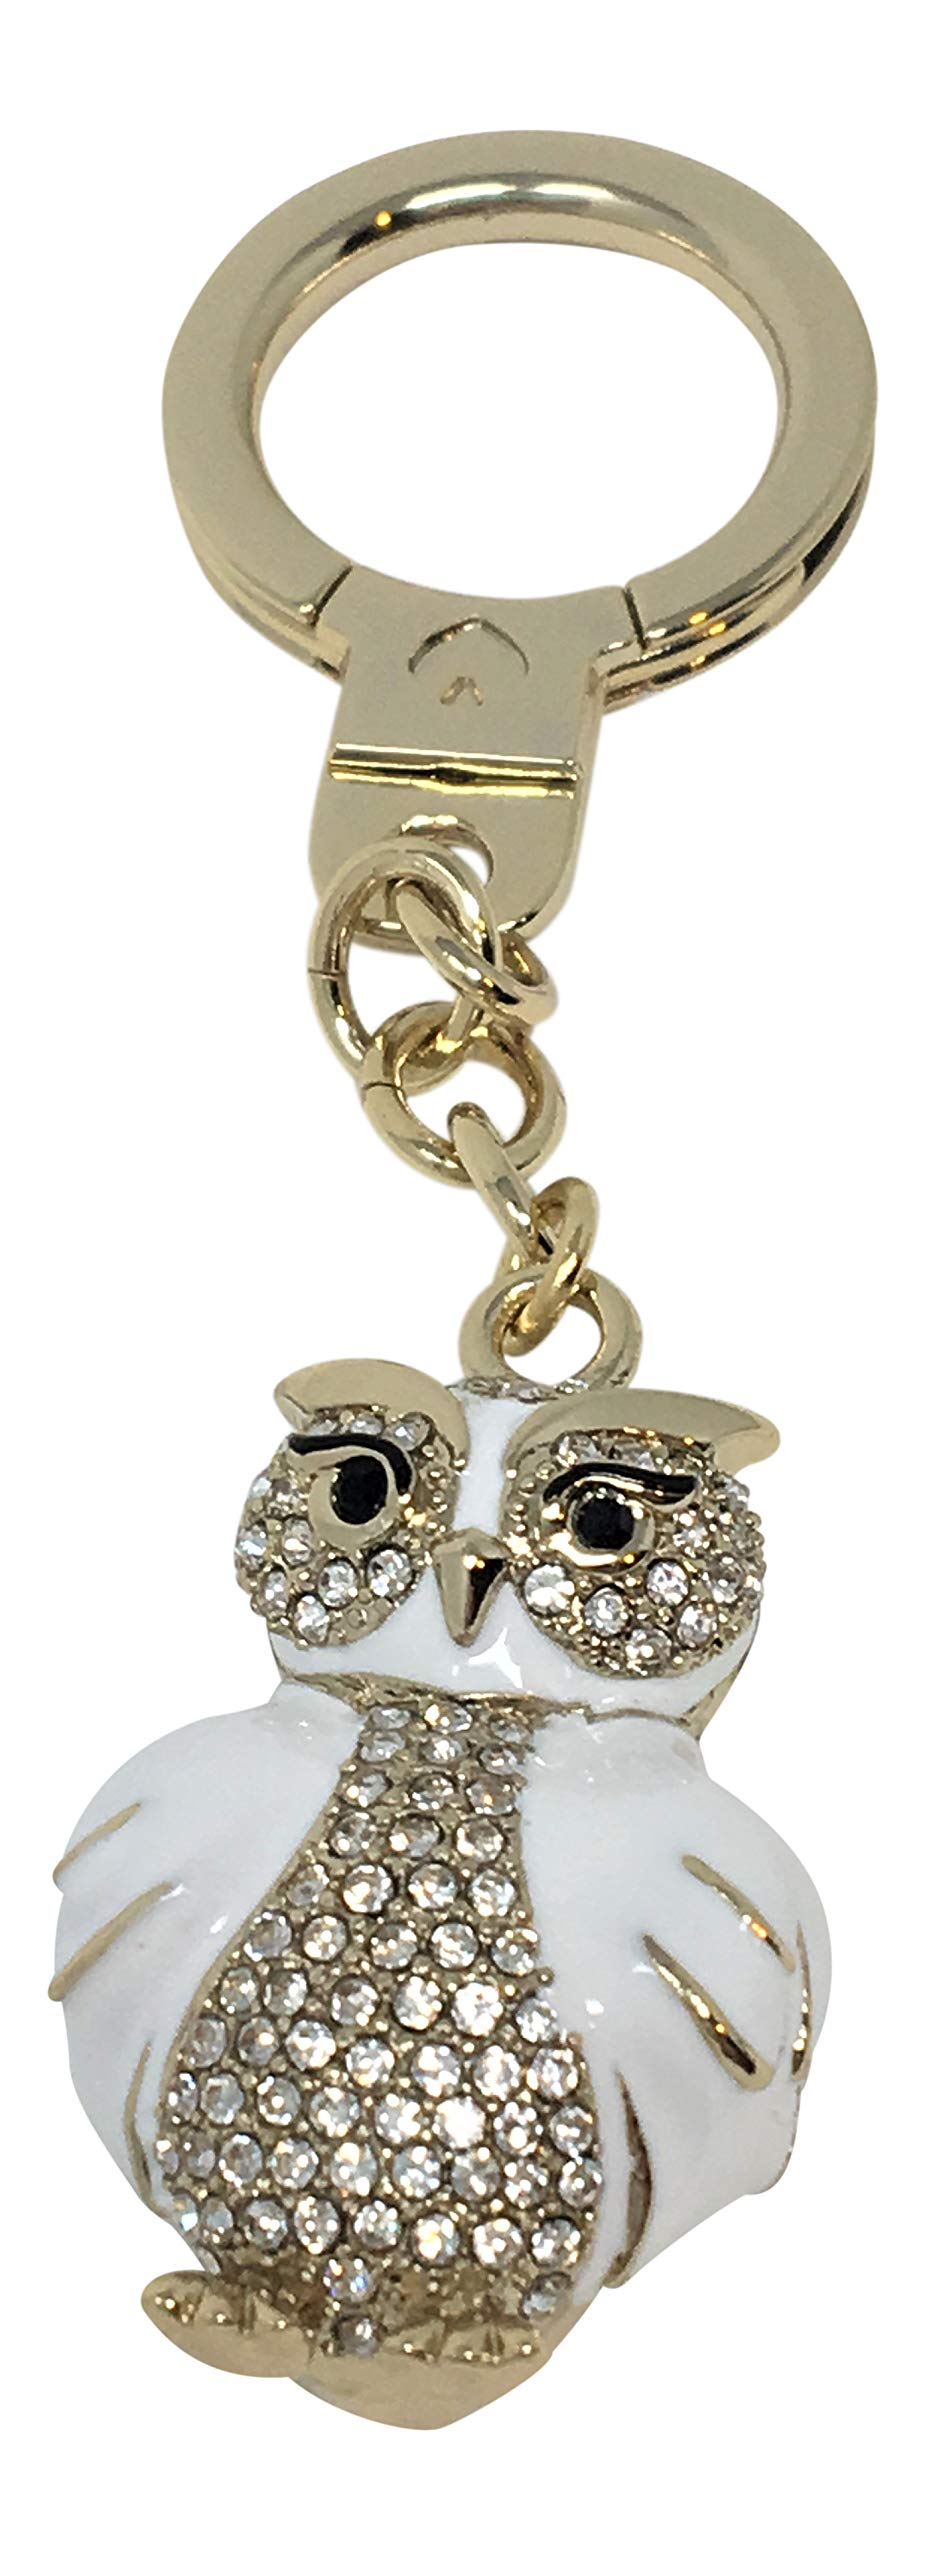 Kate Spade Jeweled Owl Key Chain Bag Charm WORU0267 White by Kate Spade New York